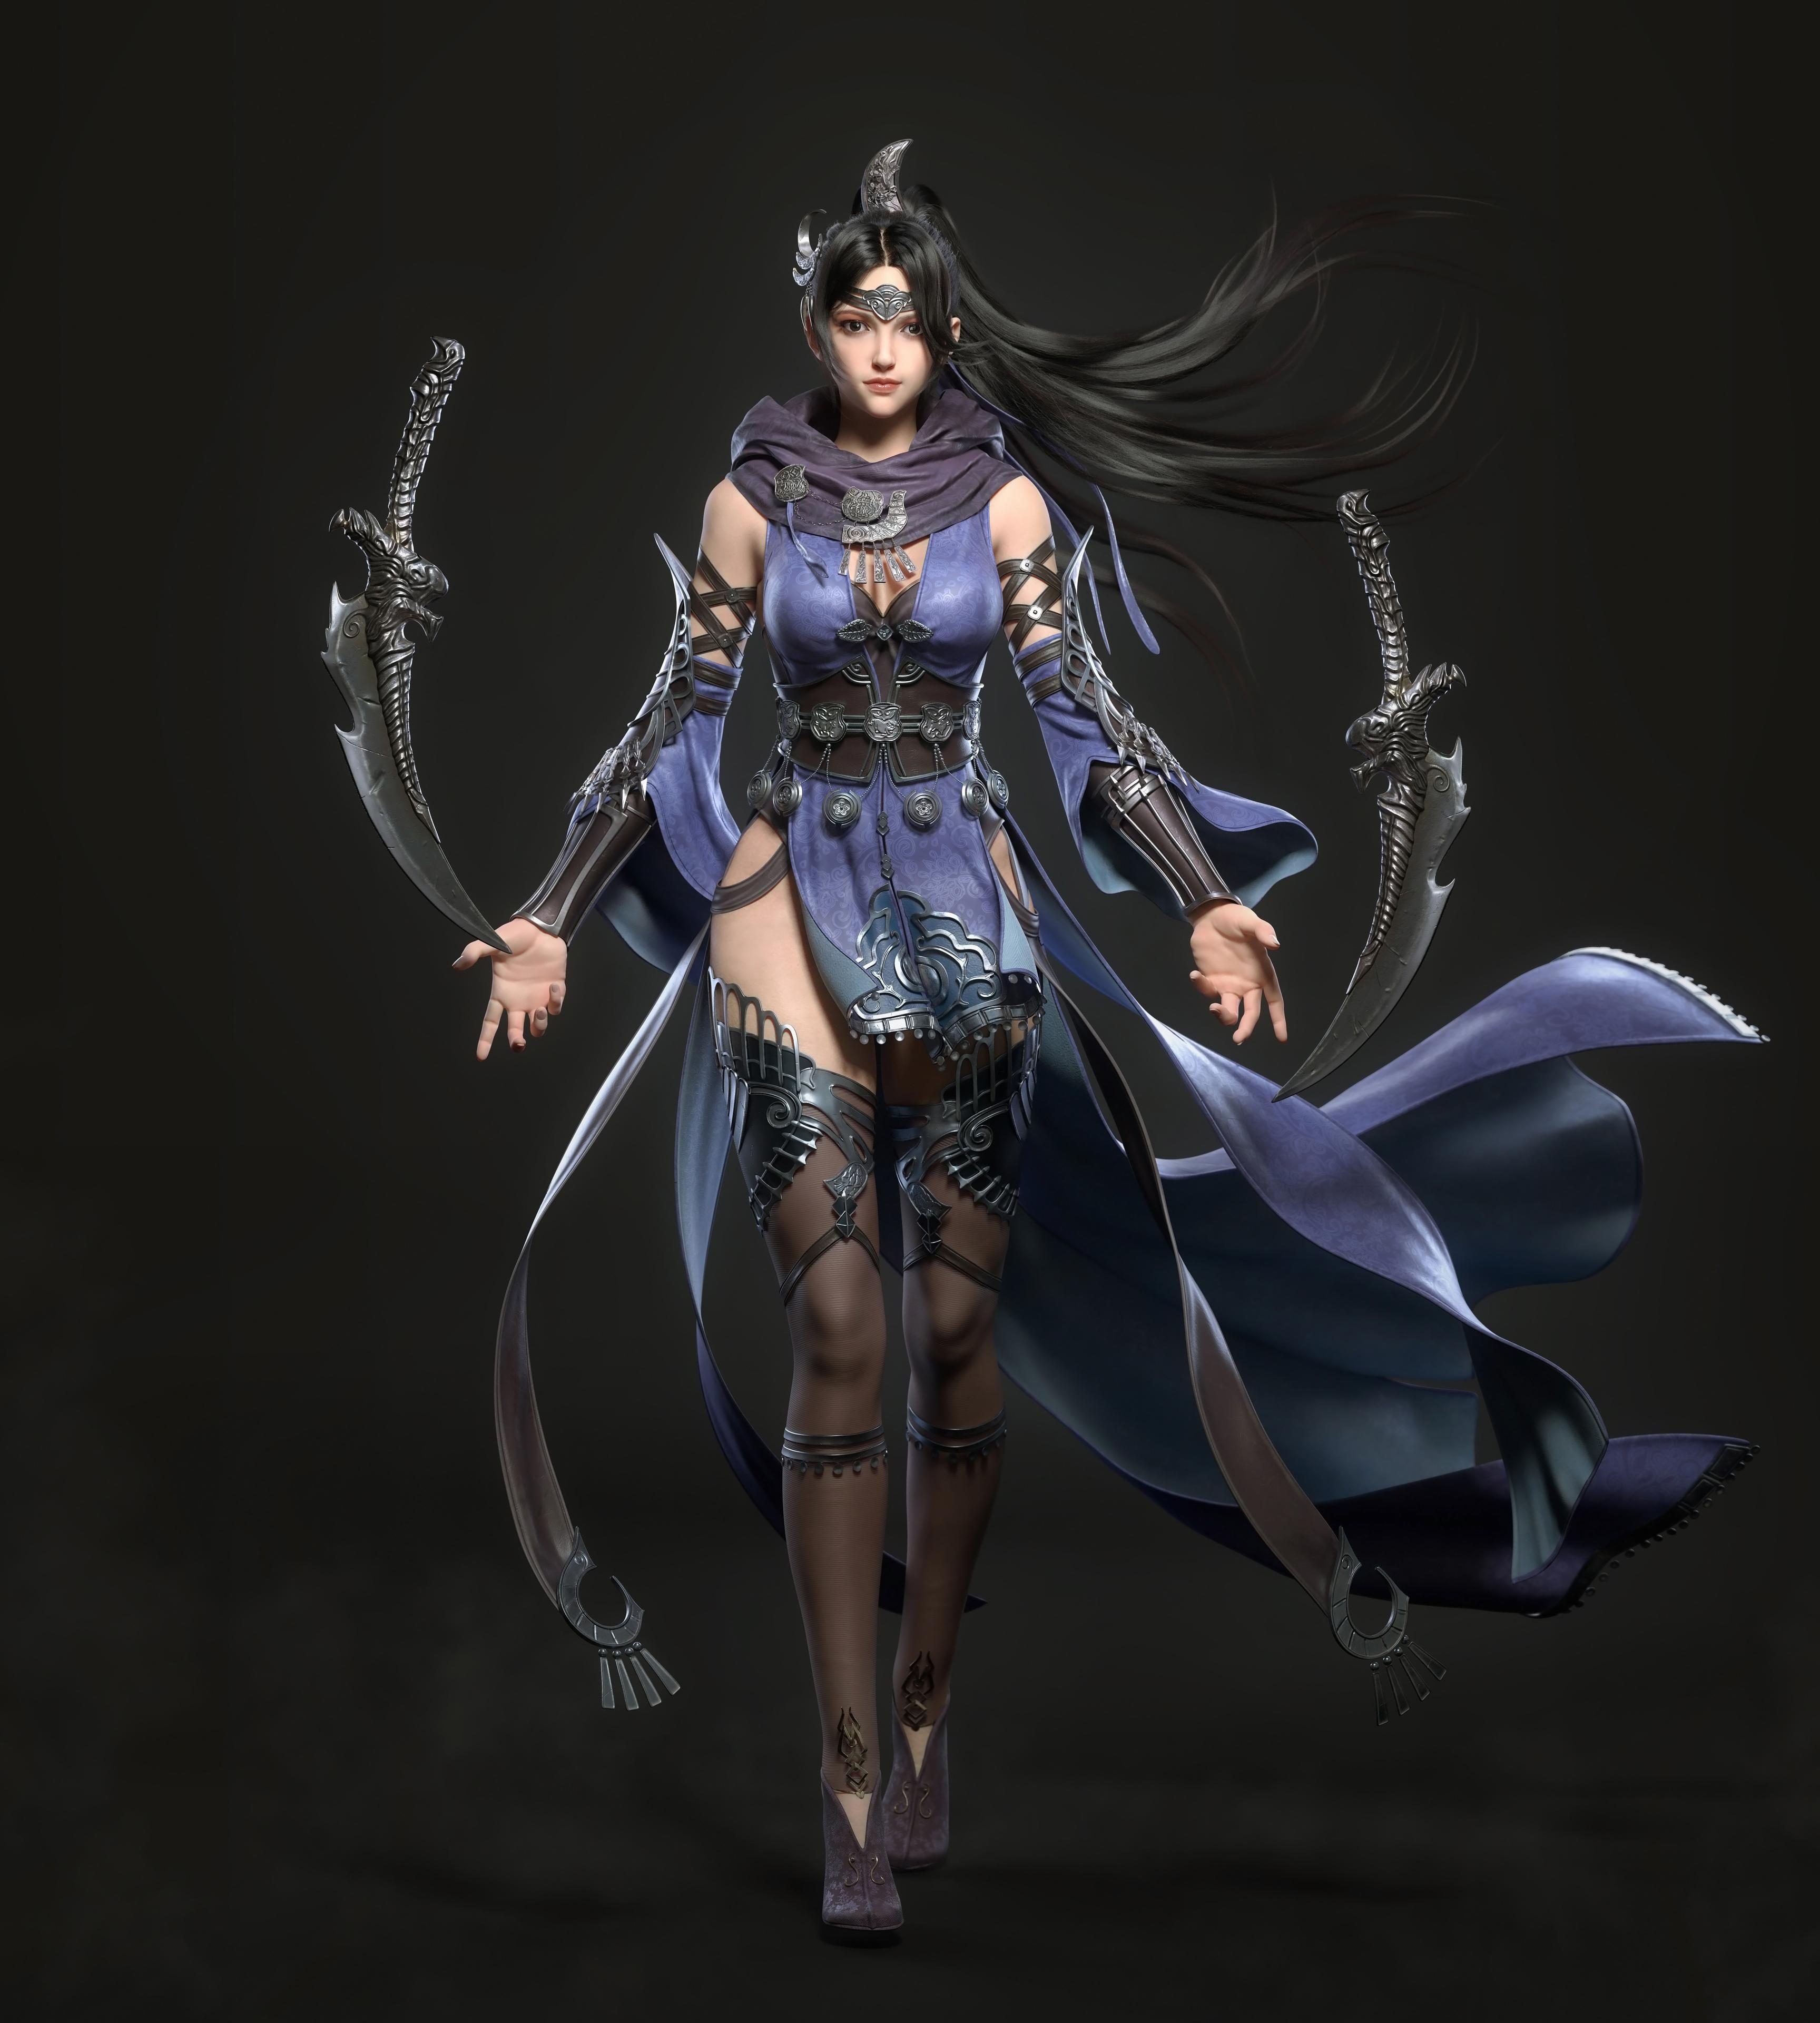 General 3455x3840 CGI women dark hair warrior long hair wind hair accessories dress armor blue clothing thigh-highs weapon dagger walking frontal view Cifangyi